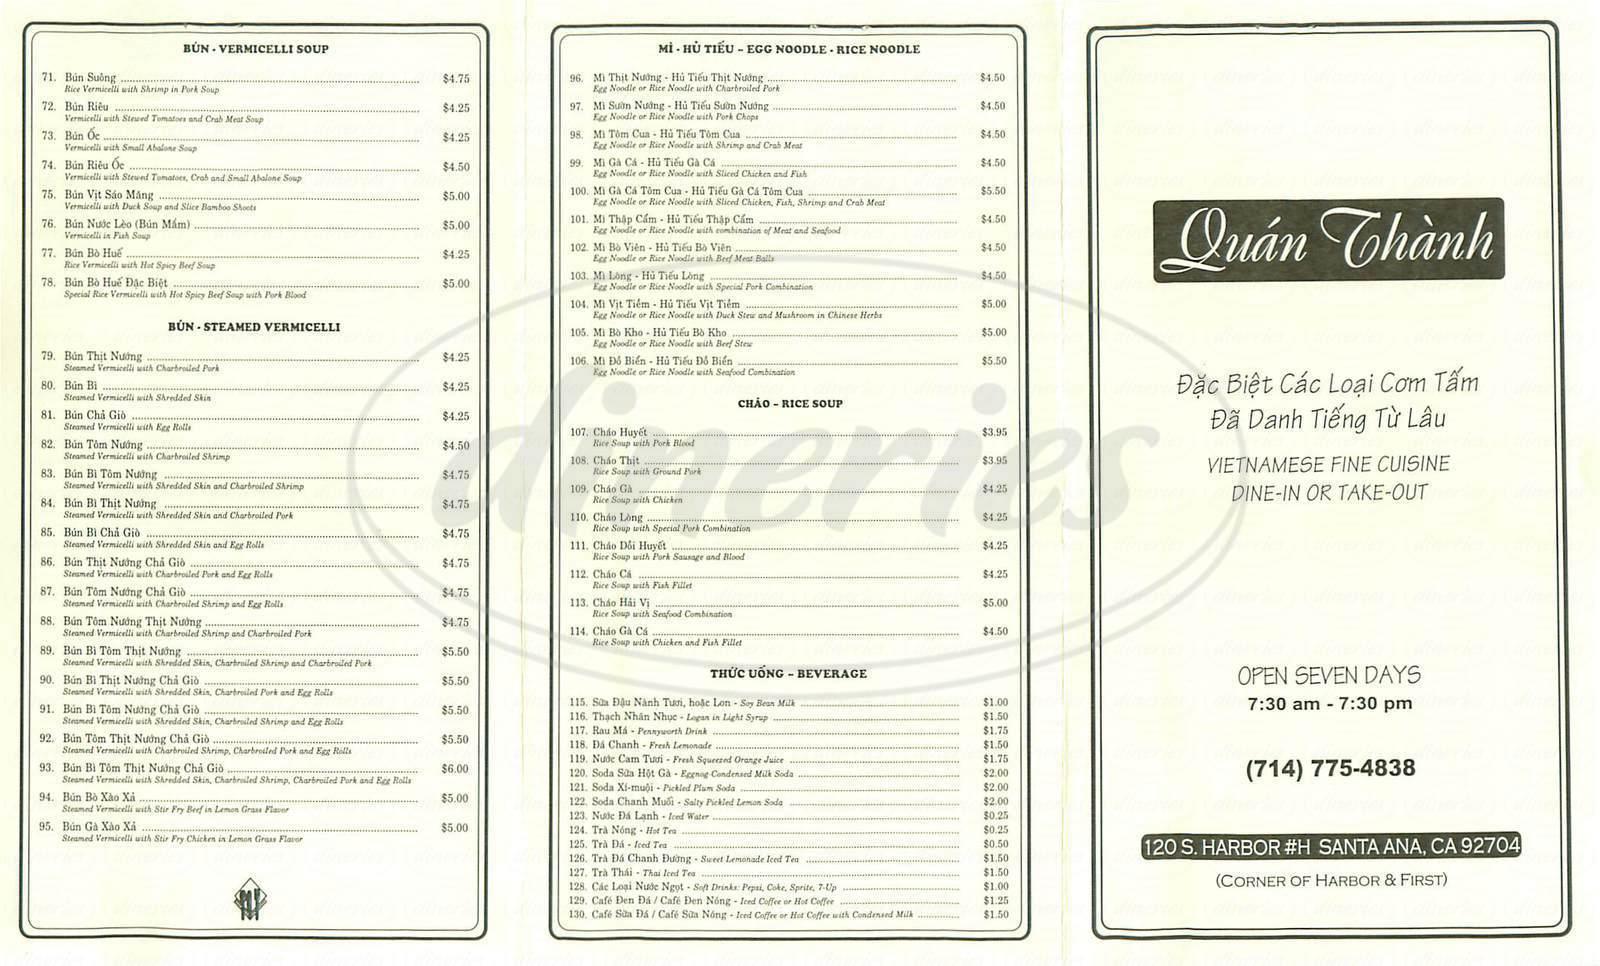 menu for Quan Thanh